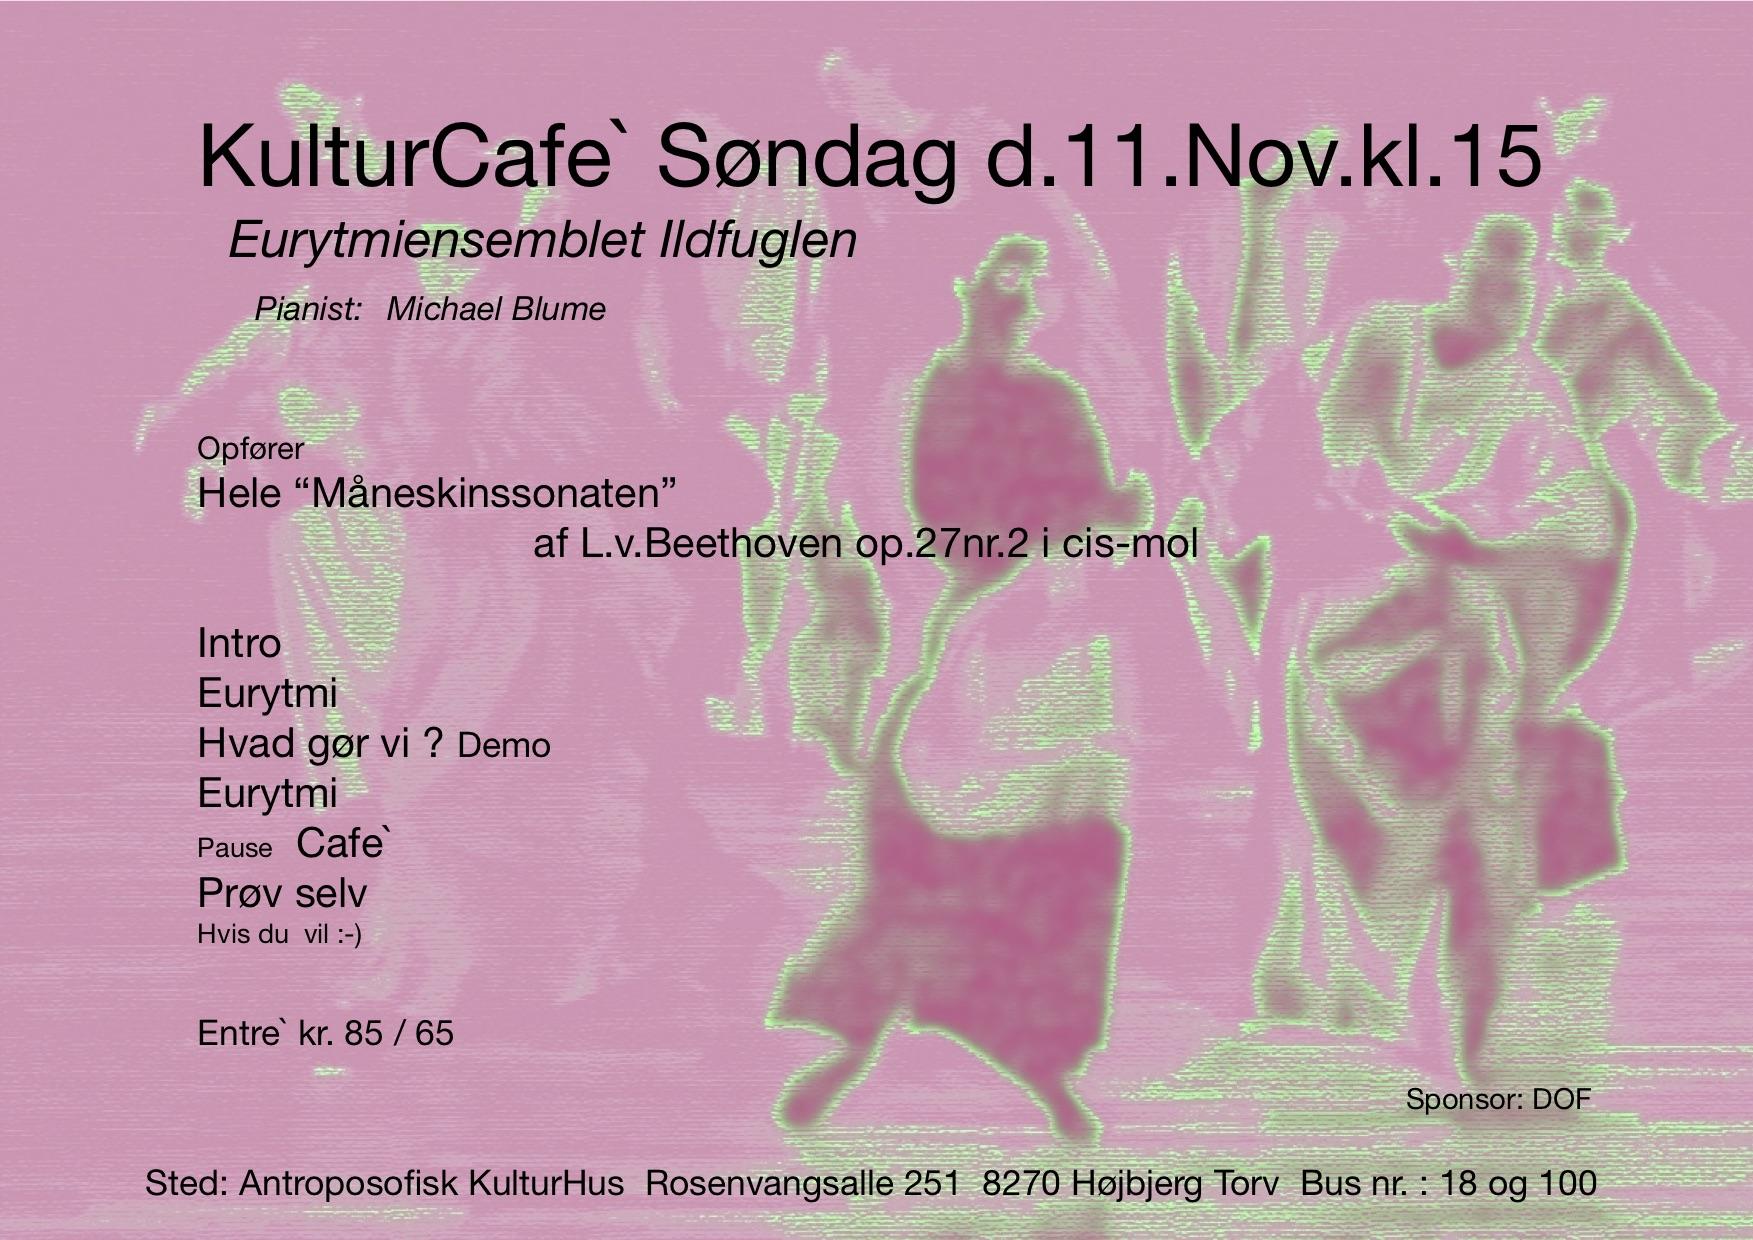 Kulturcafé 11 nov. 2018